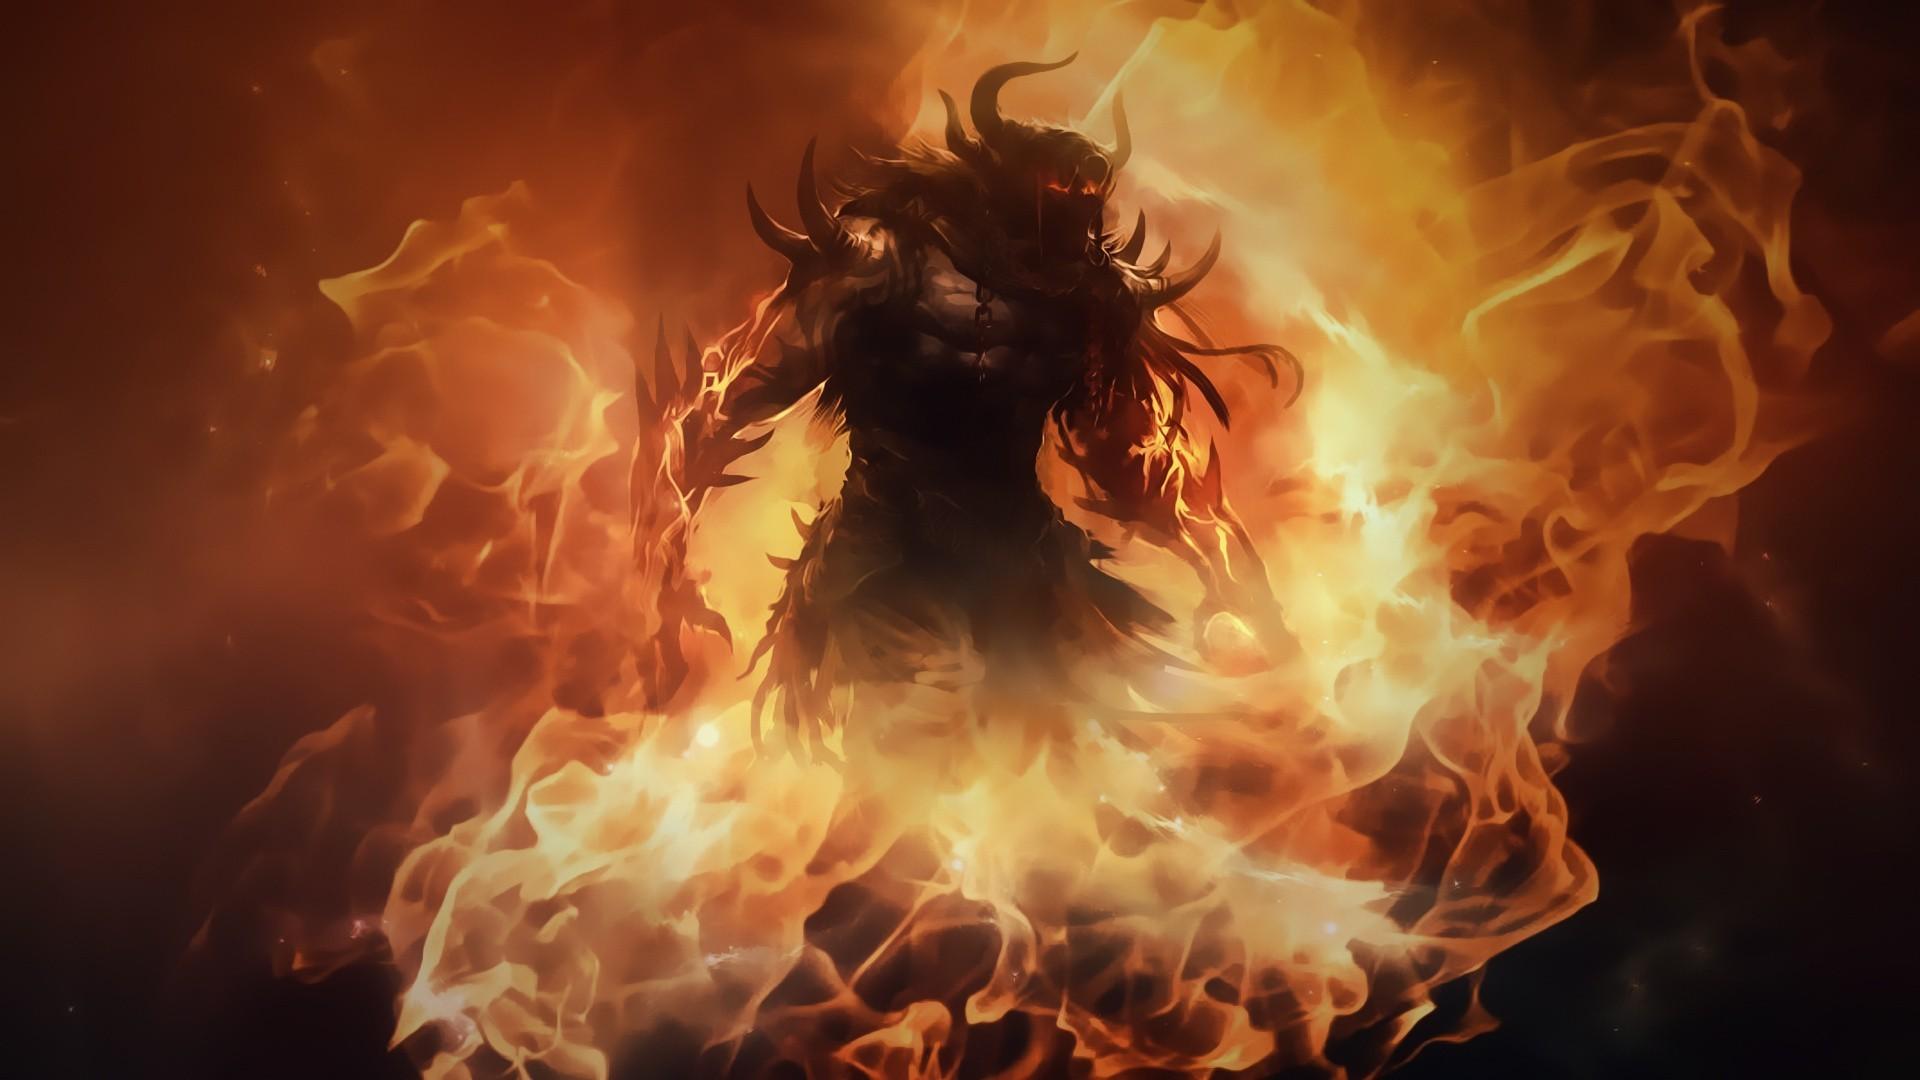 Artwork Barbarian Demons Diablo III Fantasy Art Fire Horns